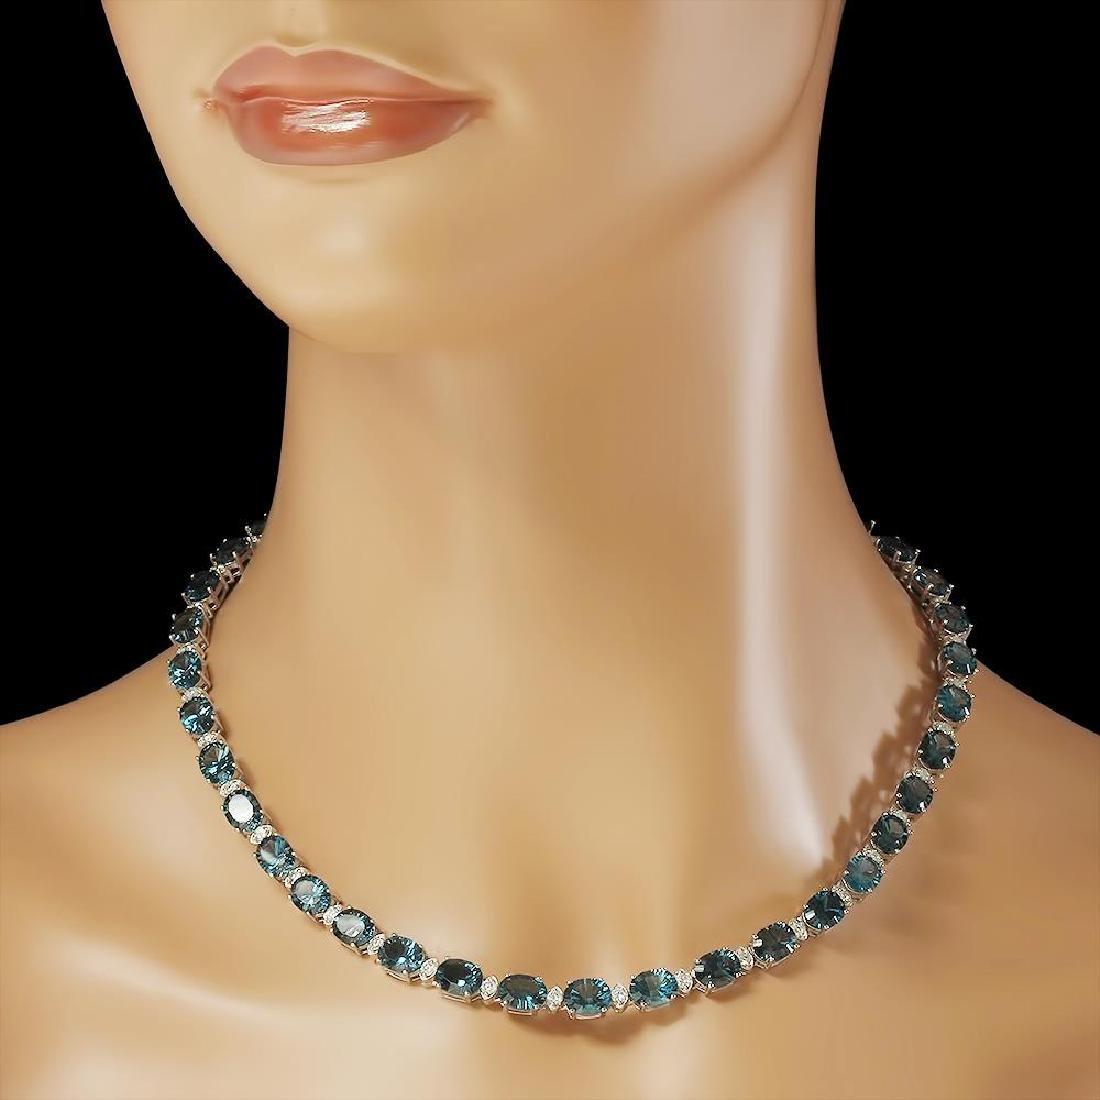 14K Gold 56.38ct Topaz 2.73ct Diamond Necklace - 3